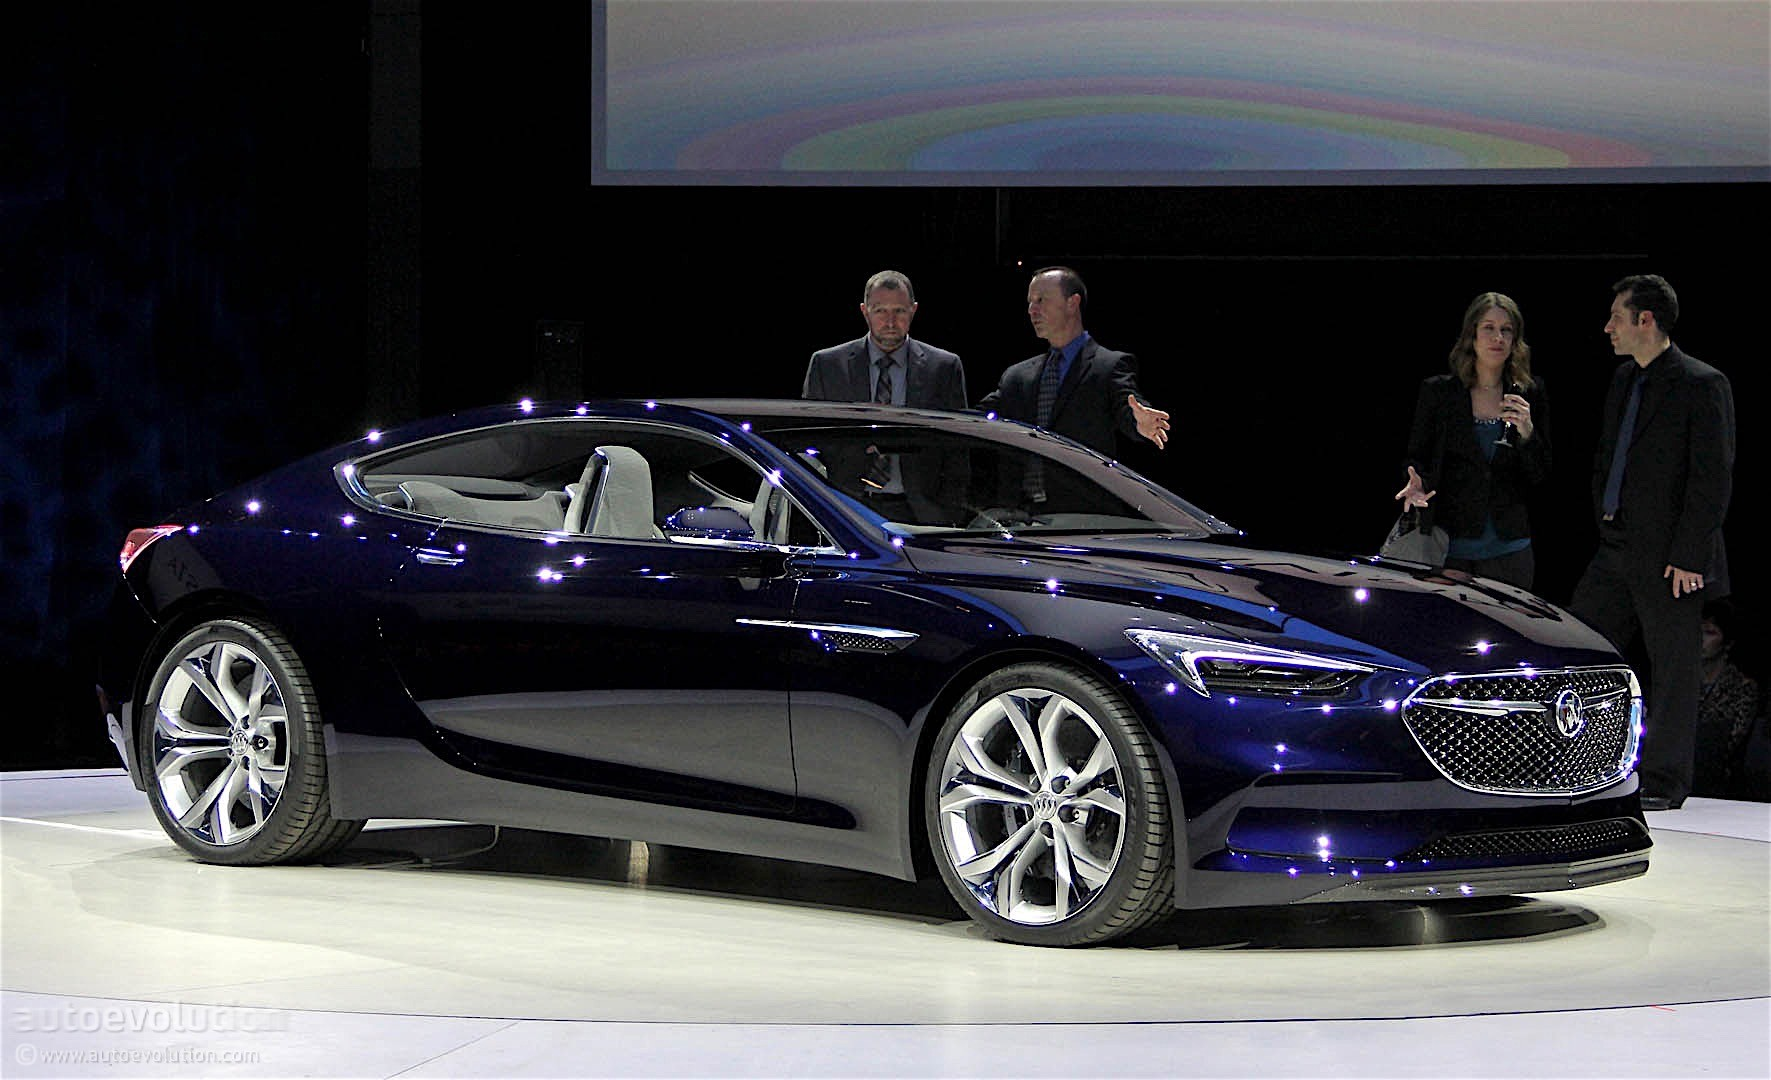 Buick avista concept bows at 2016 detroit auto show - Auto motor show ...